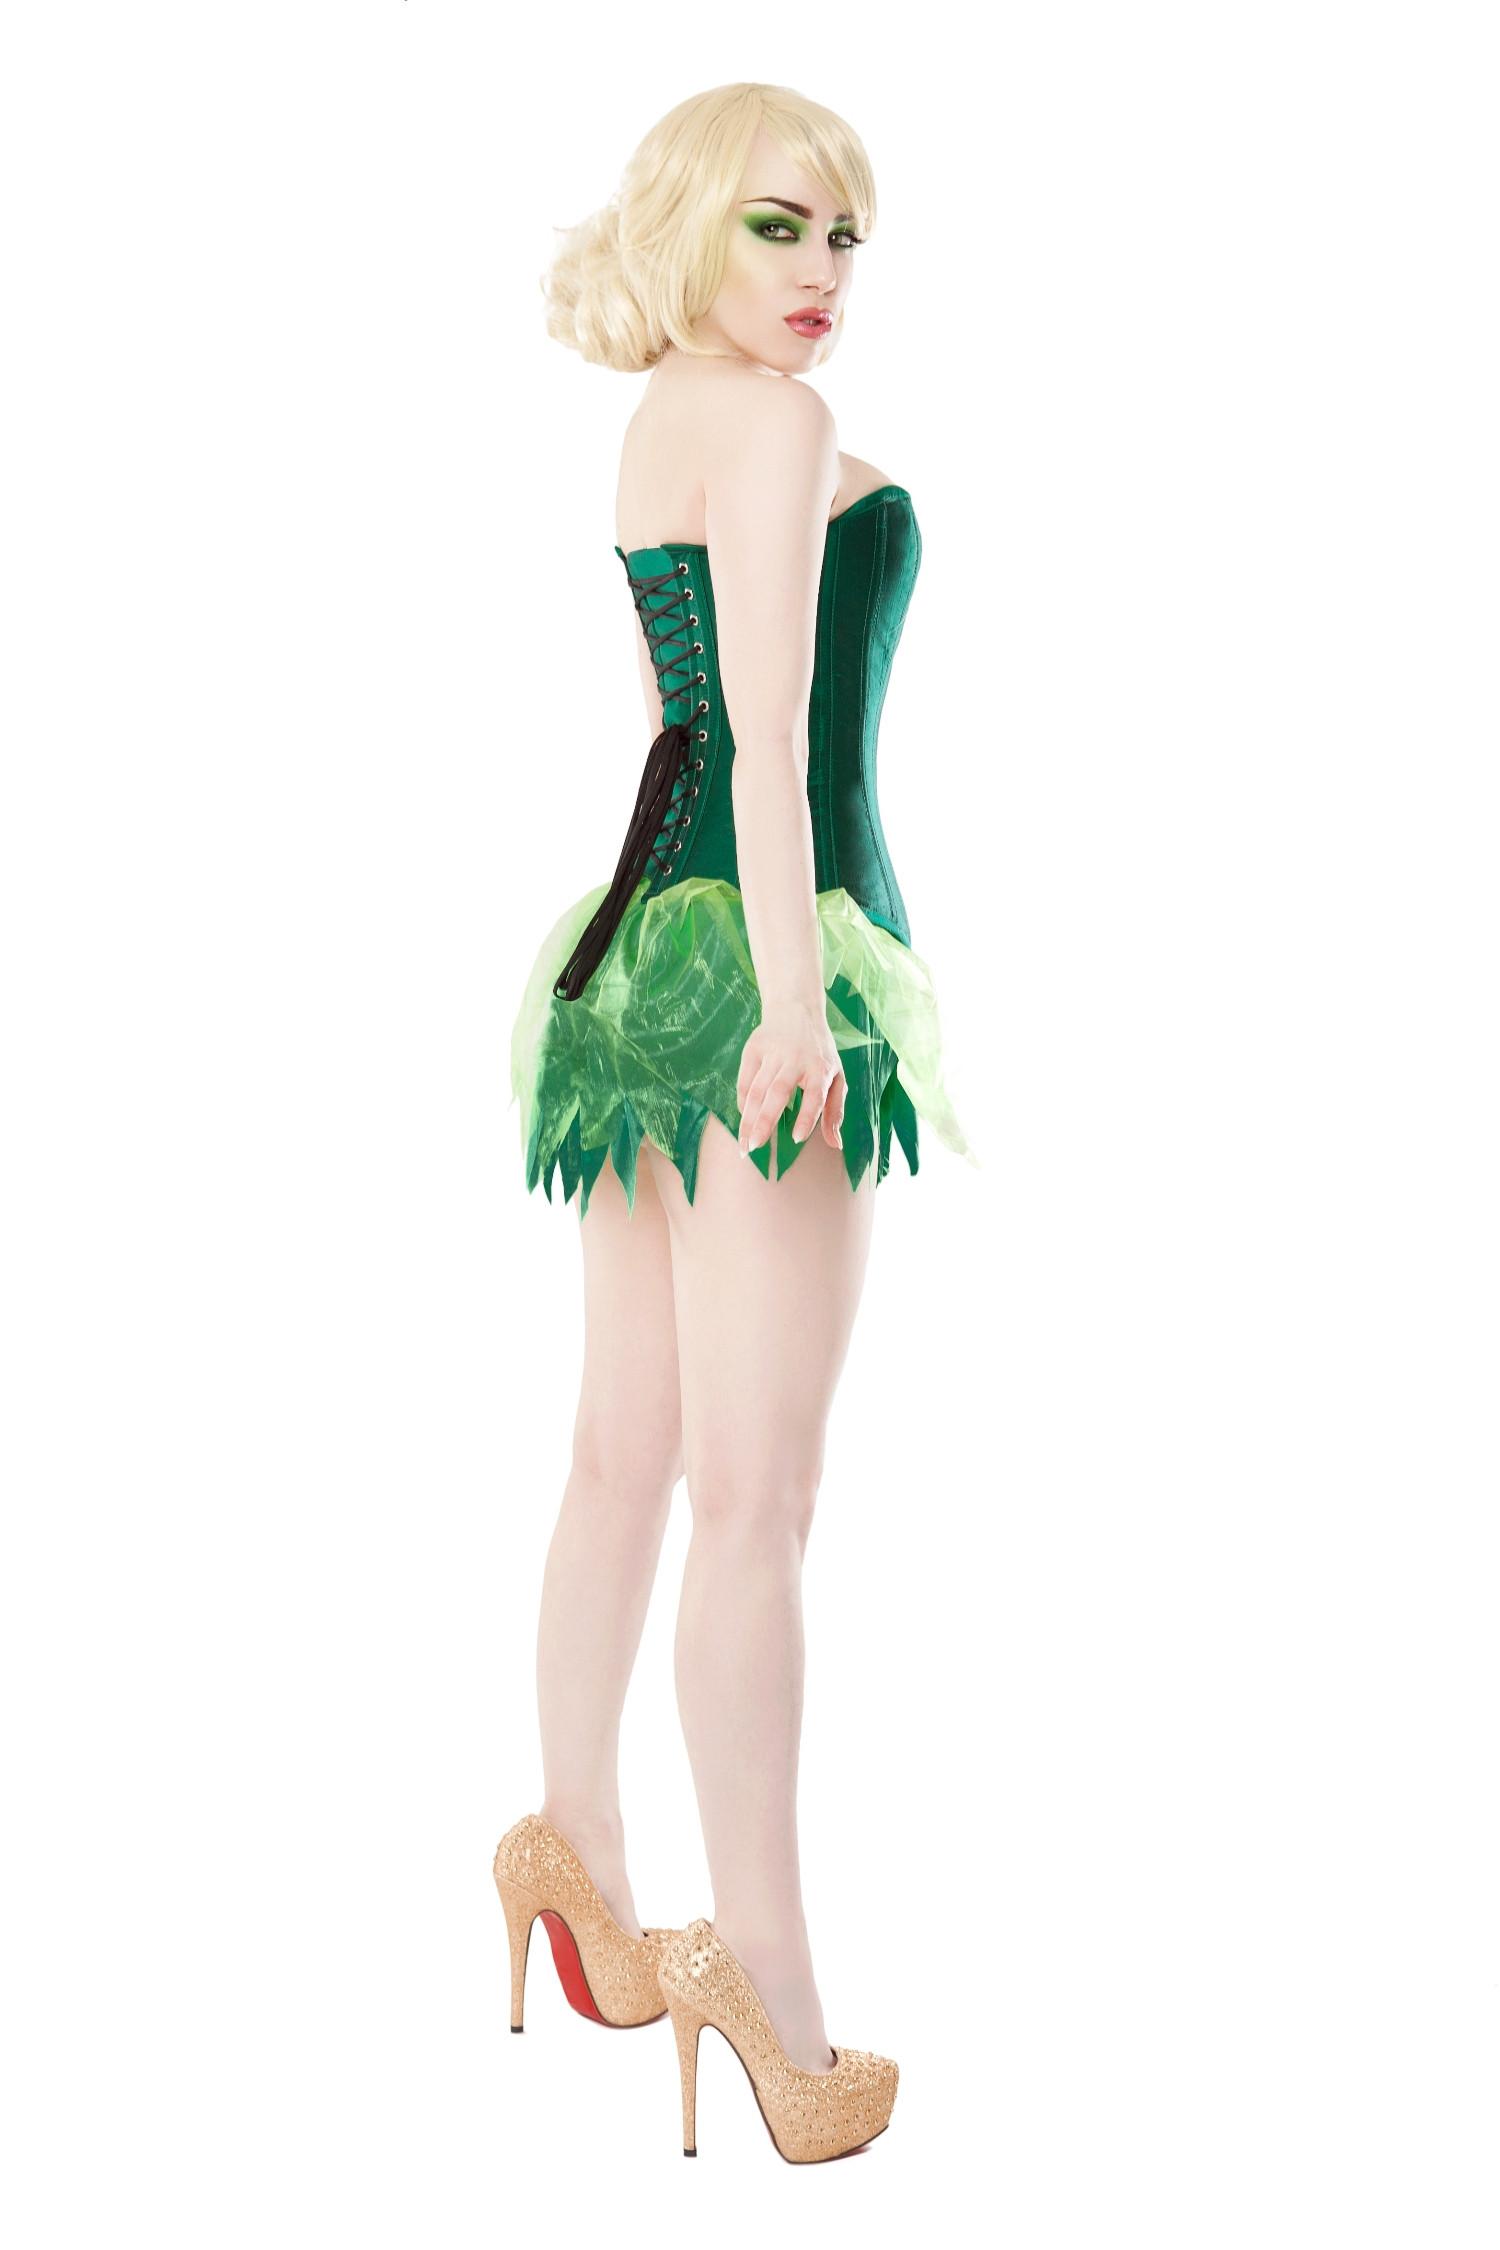 Playgirl Green Tinkerbell Fairy Tutu Skirt